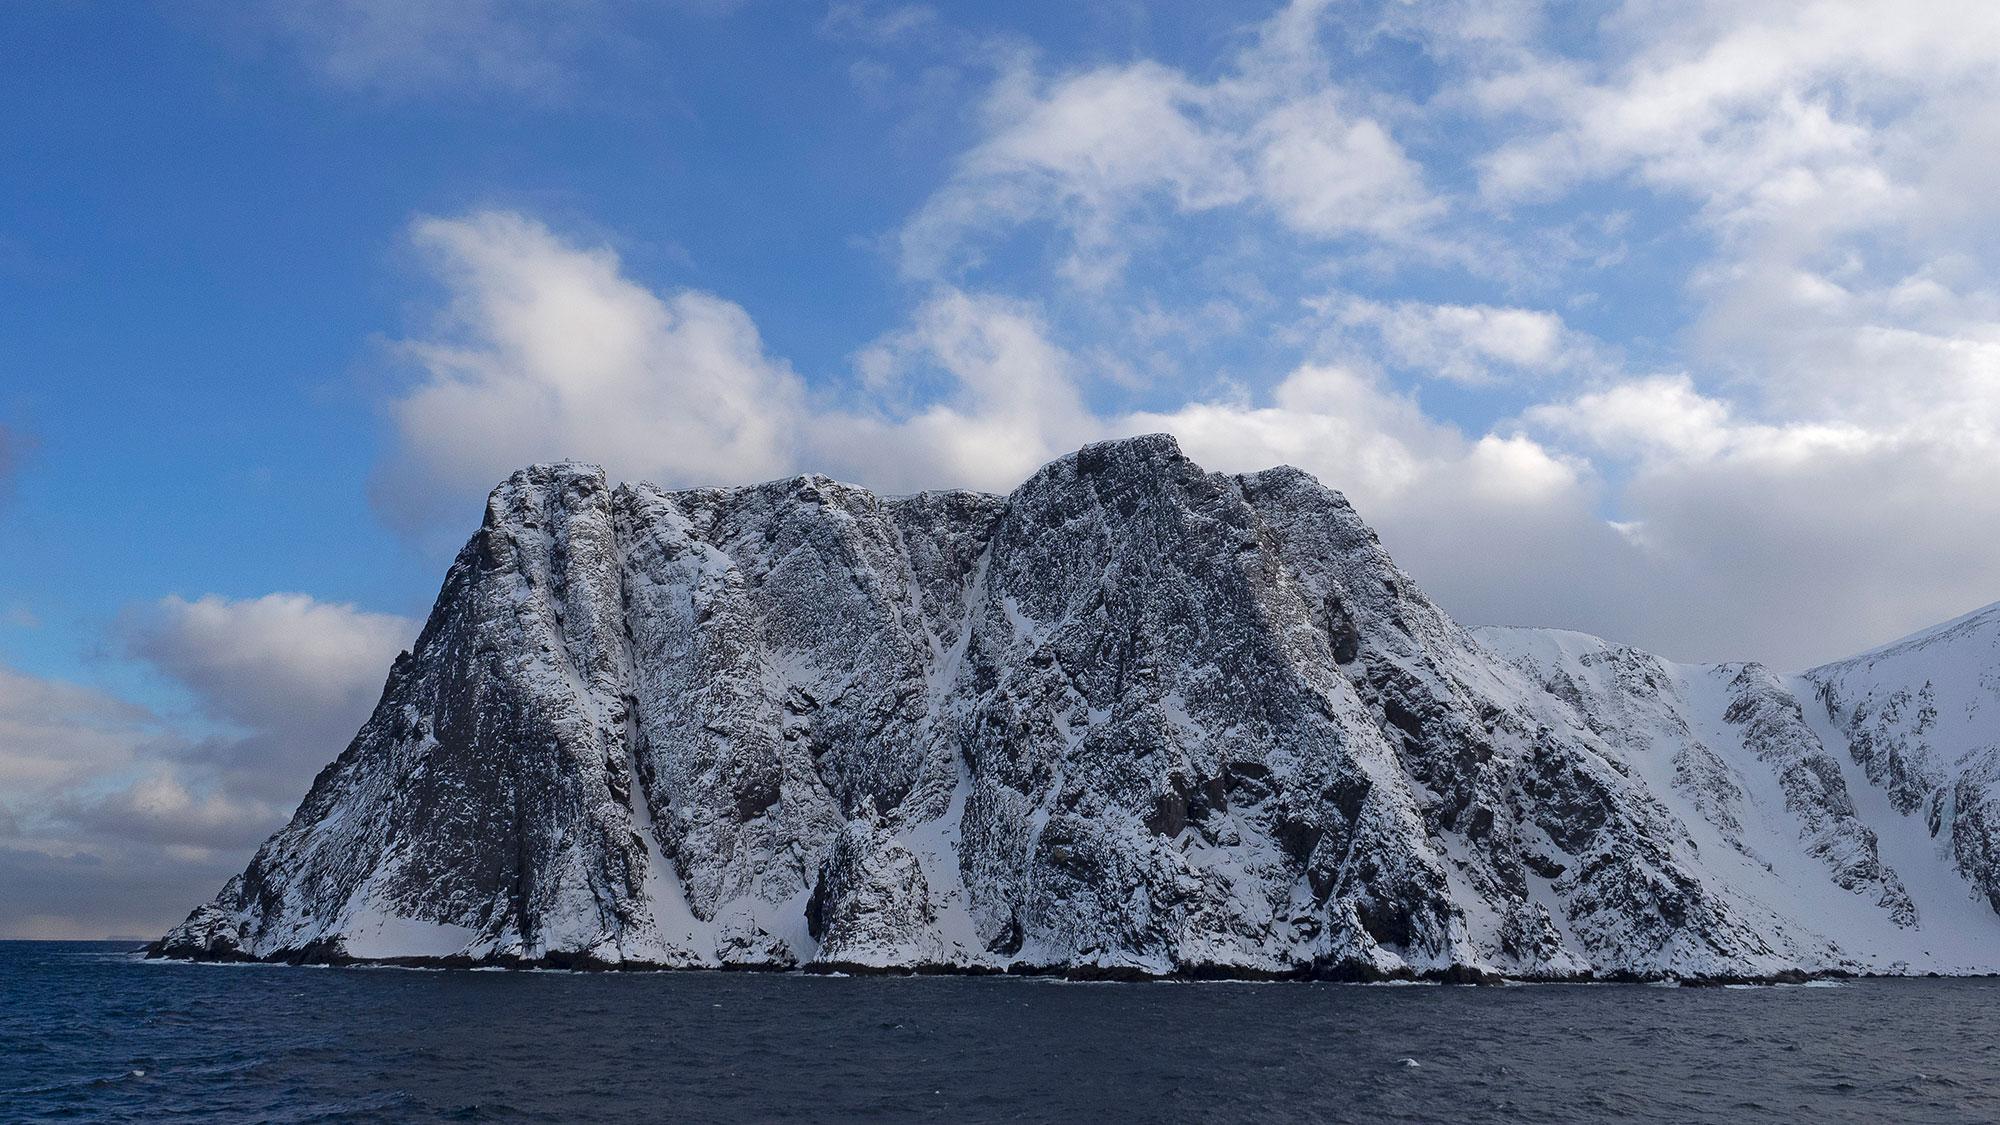 Fotografie Nordkap im Winter